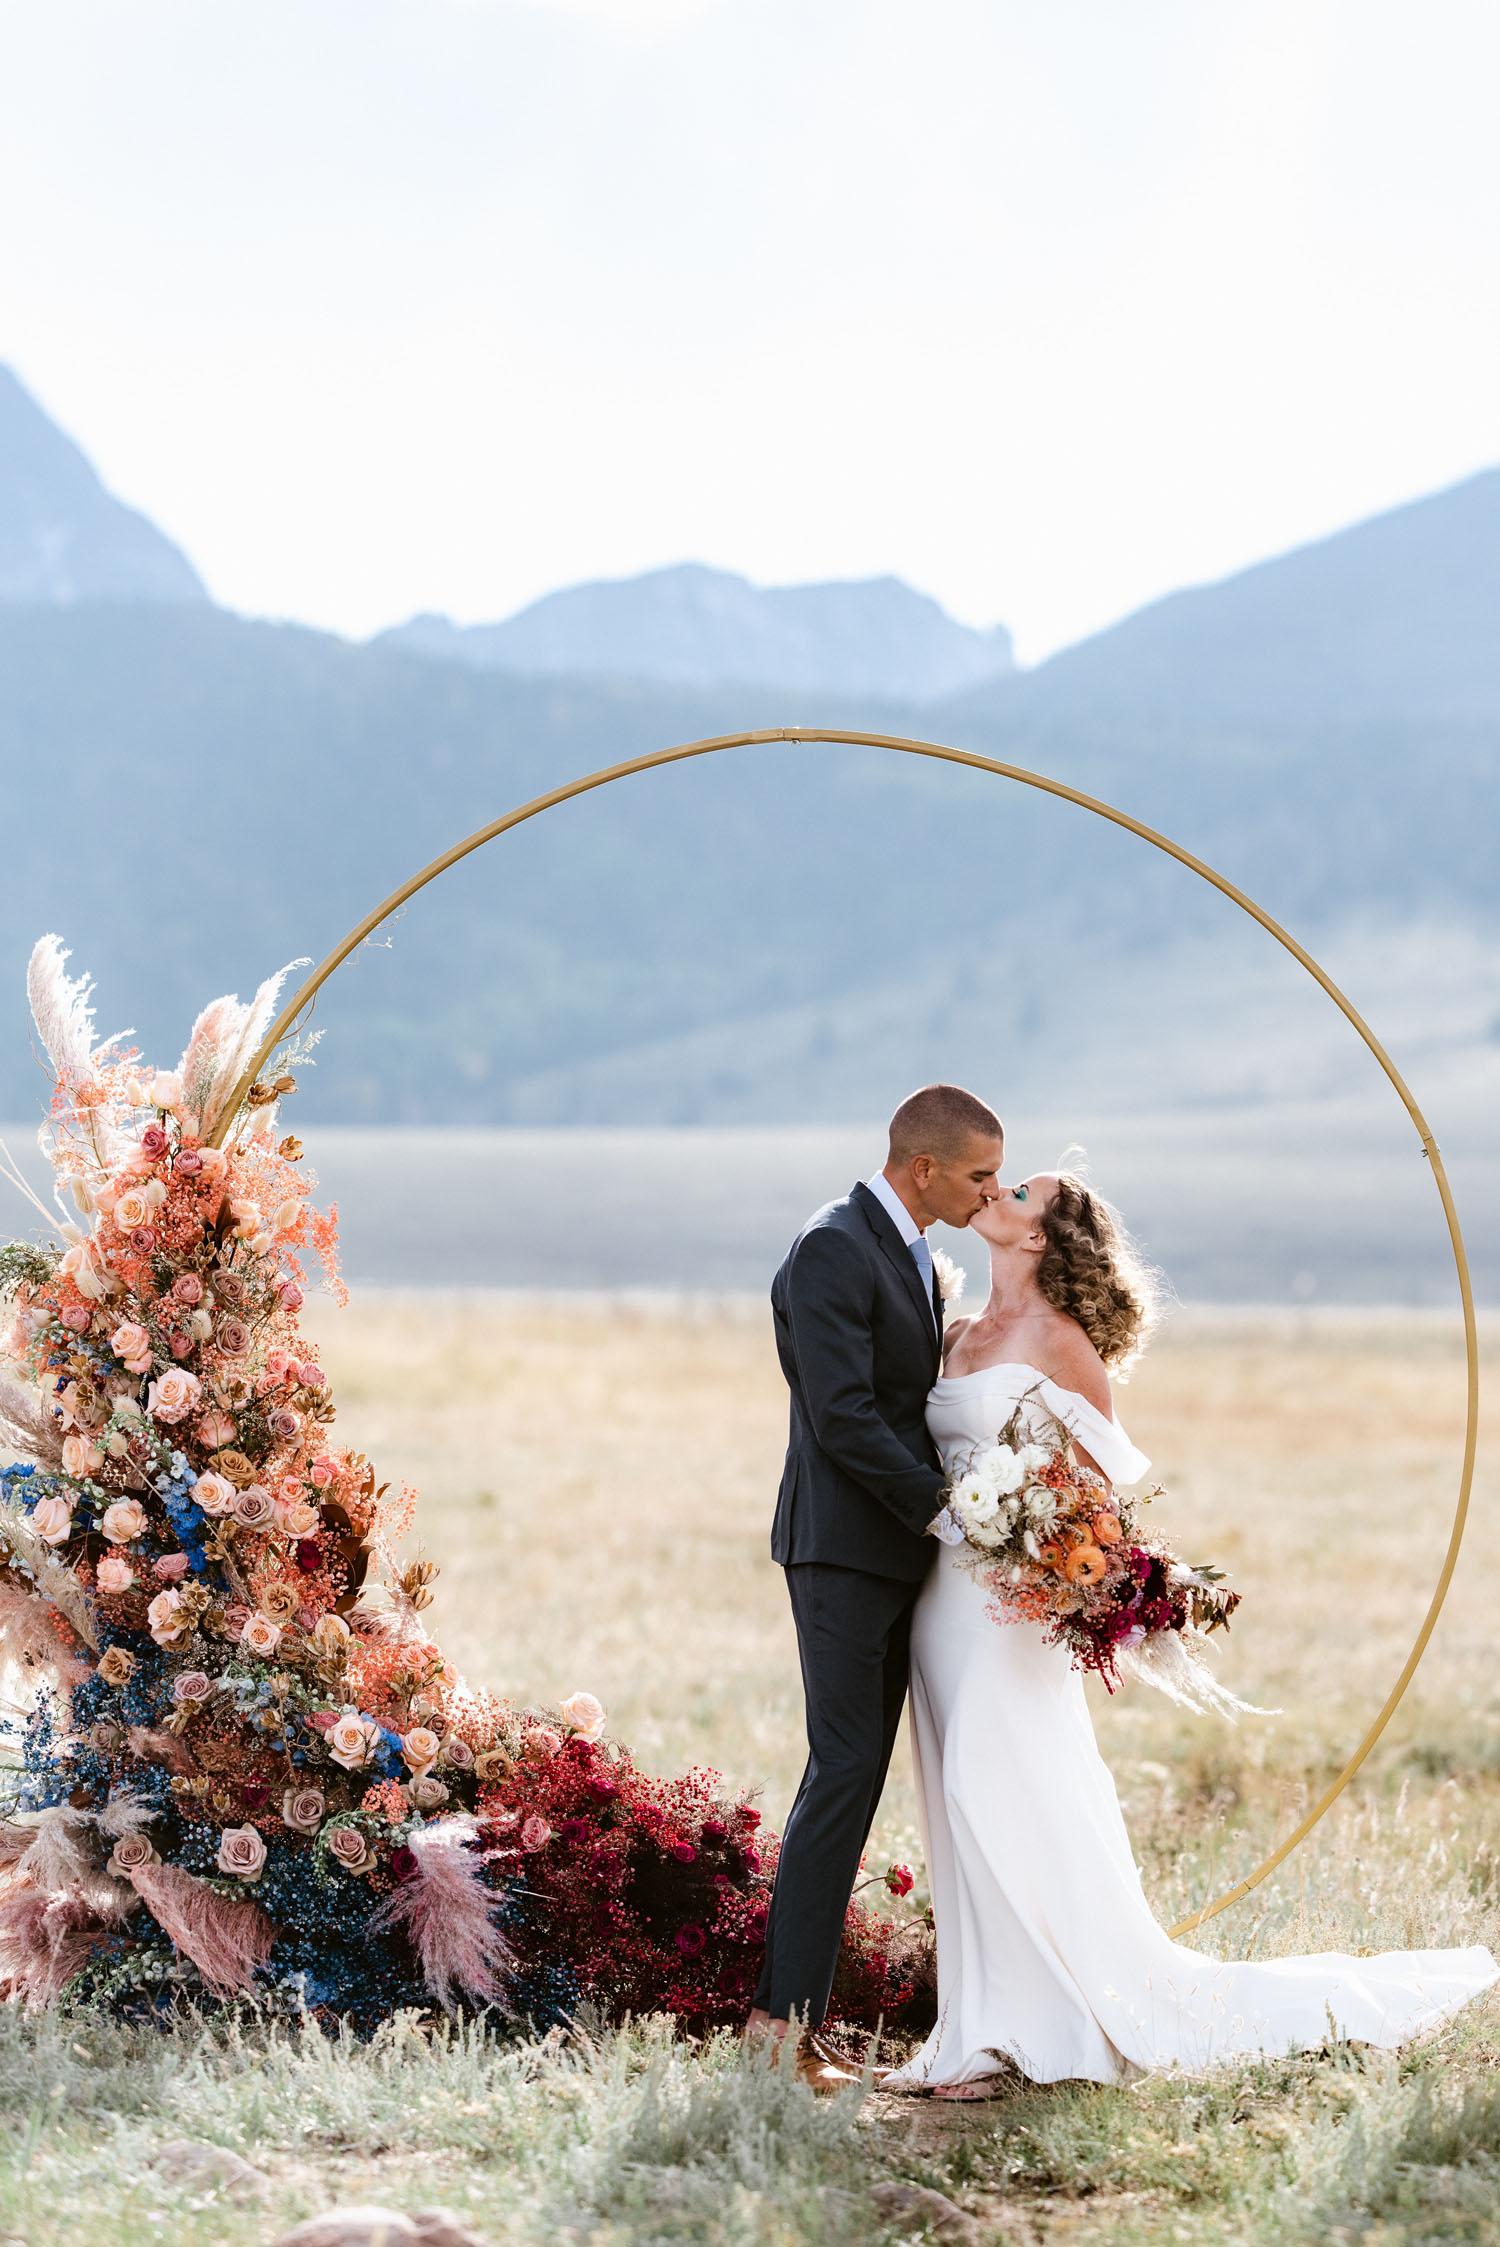 circle flower arch ceremony decor